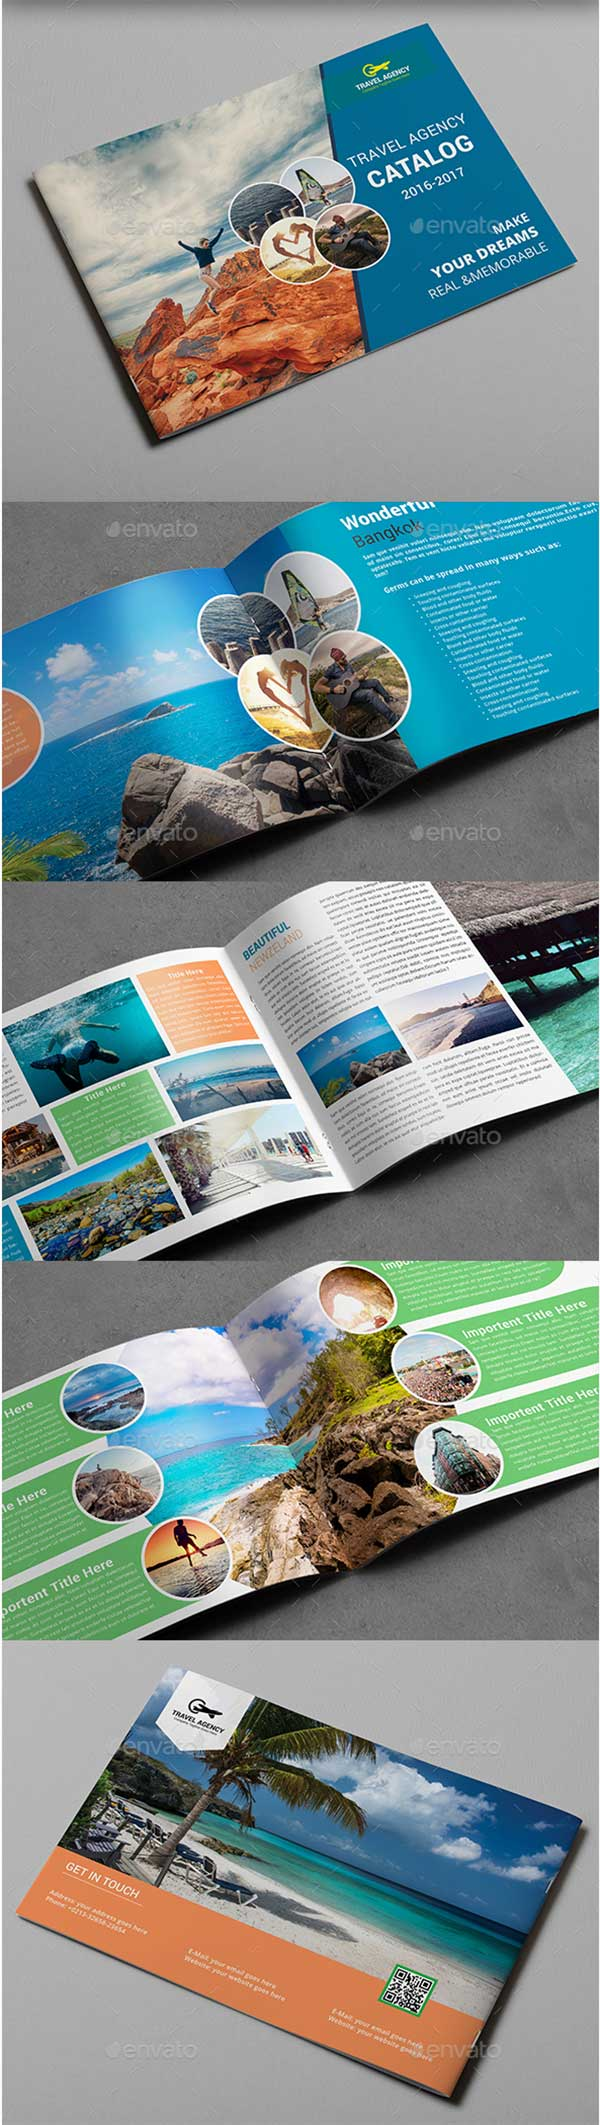 travel-agency-brochure-catalog-template